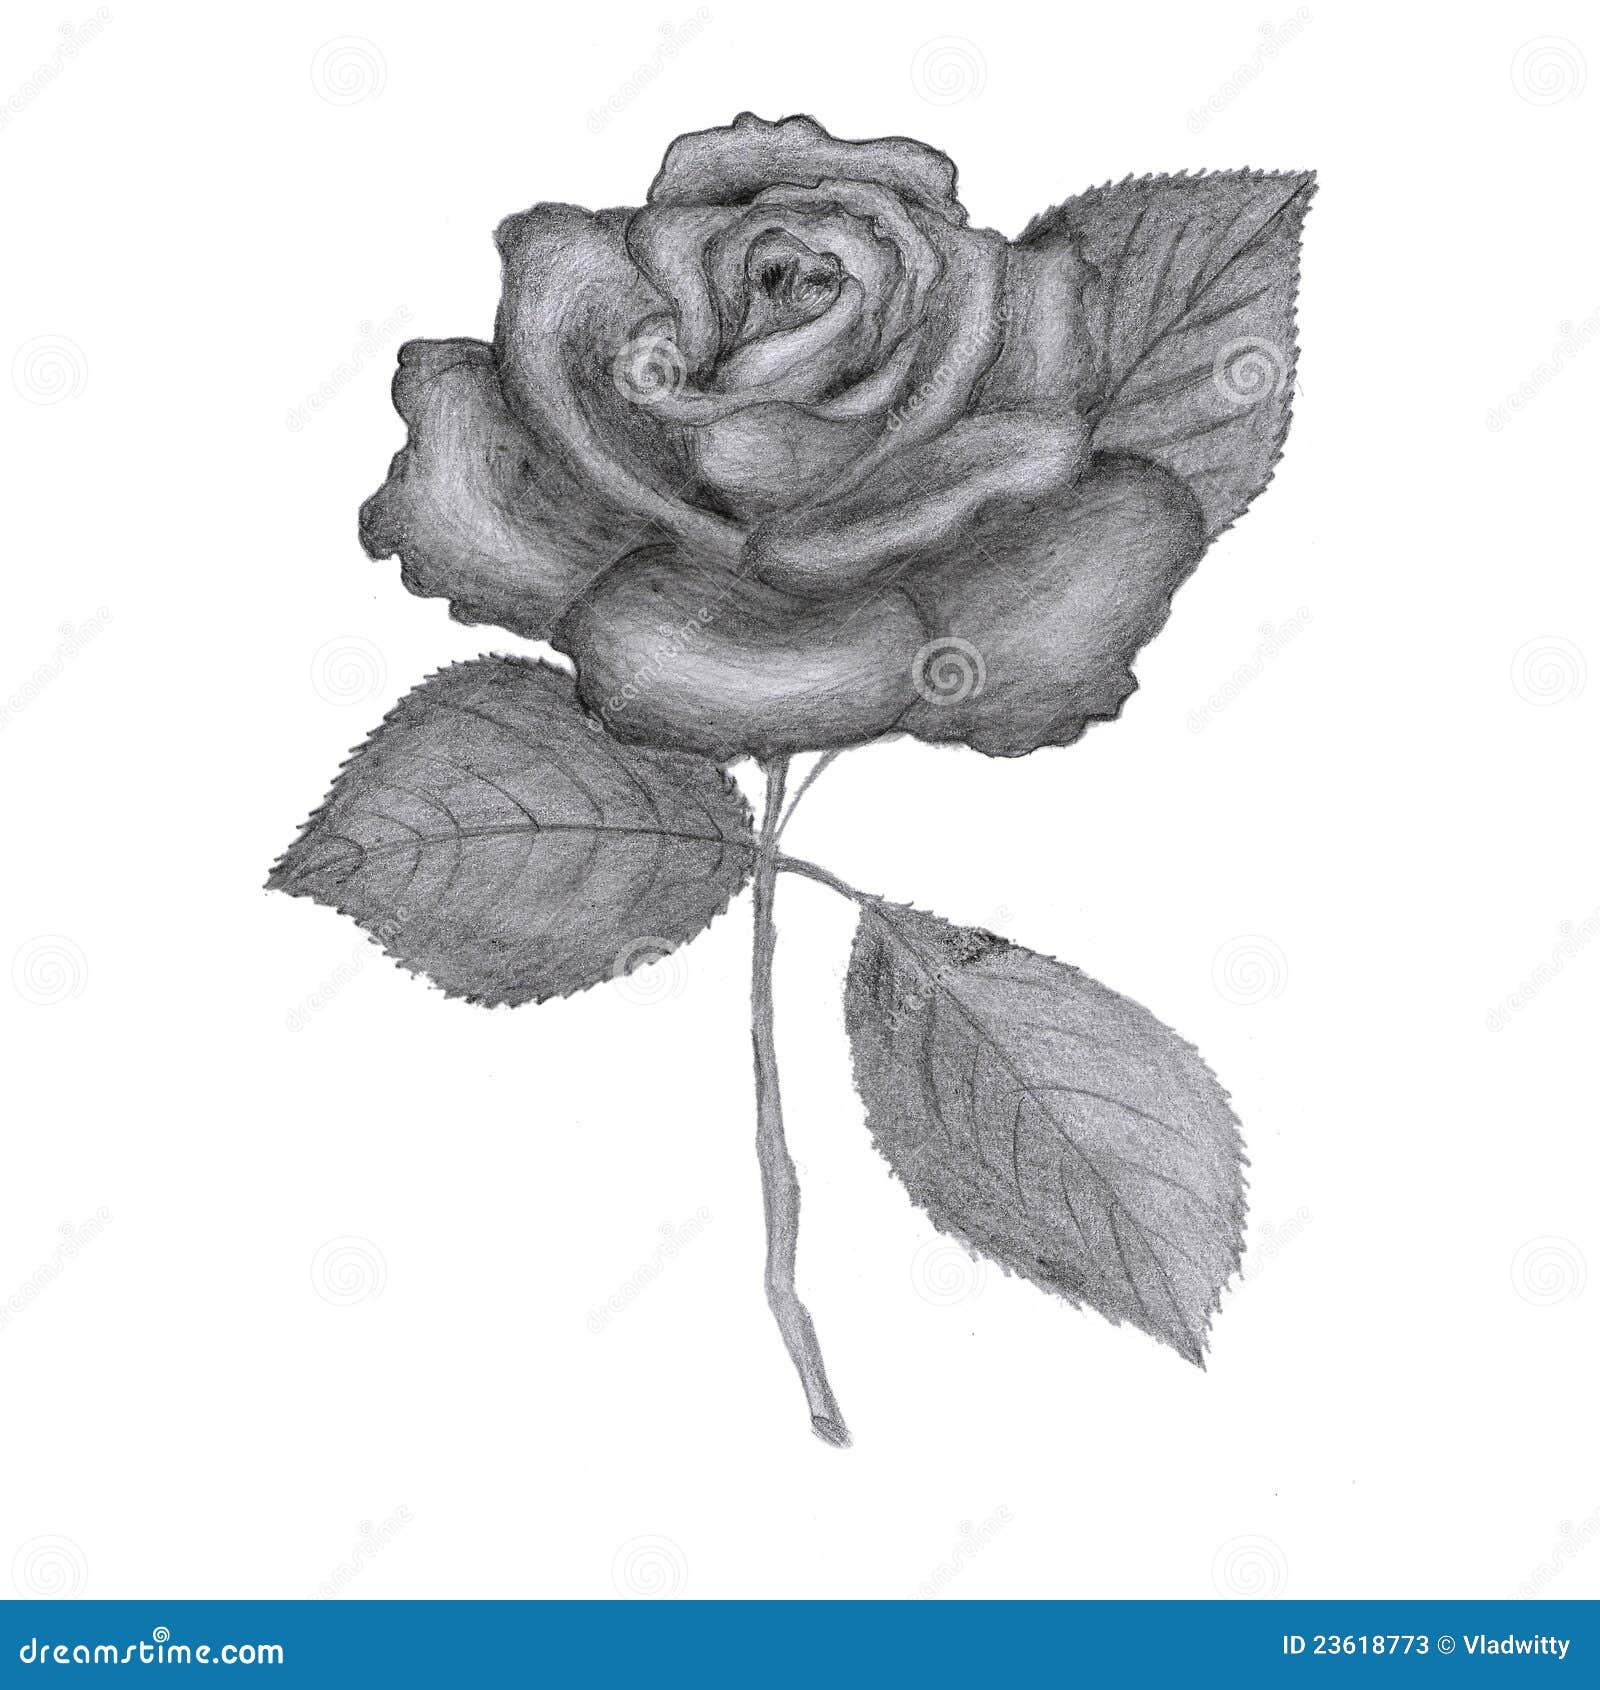 Drawn Rose Stock Photos Image 23618773